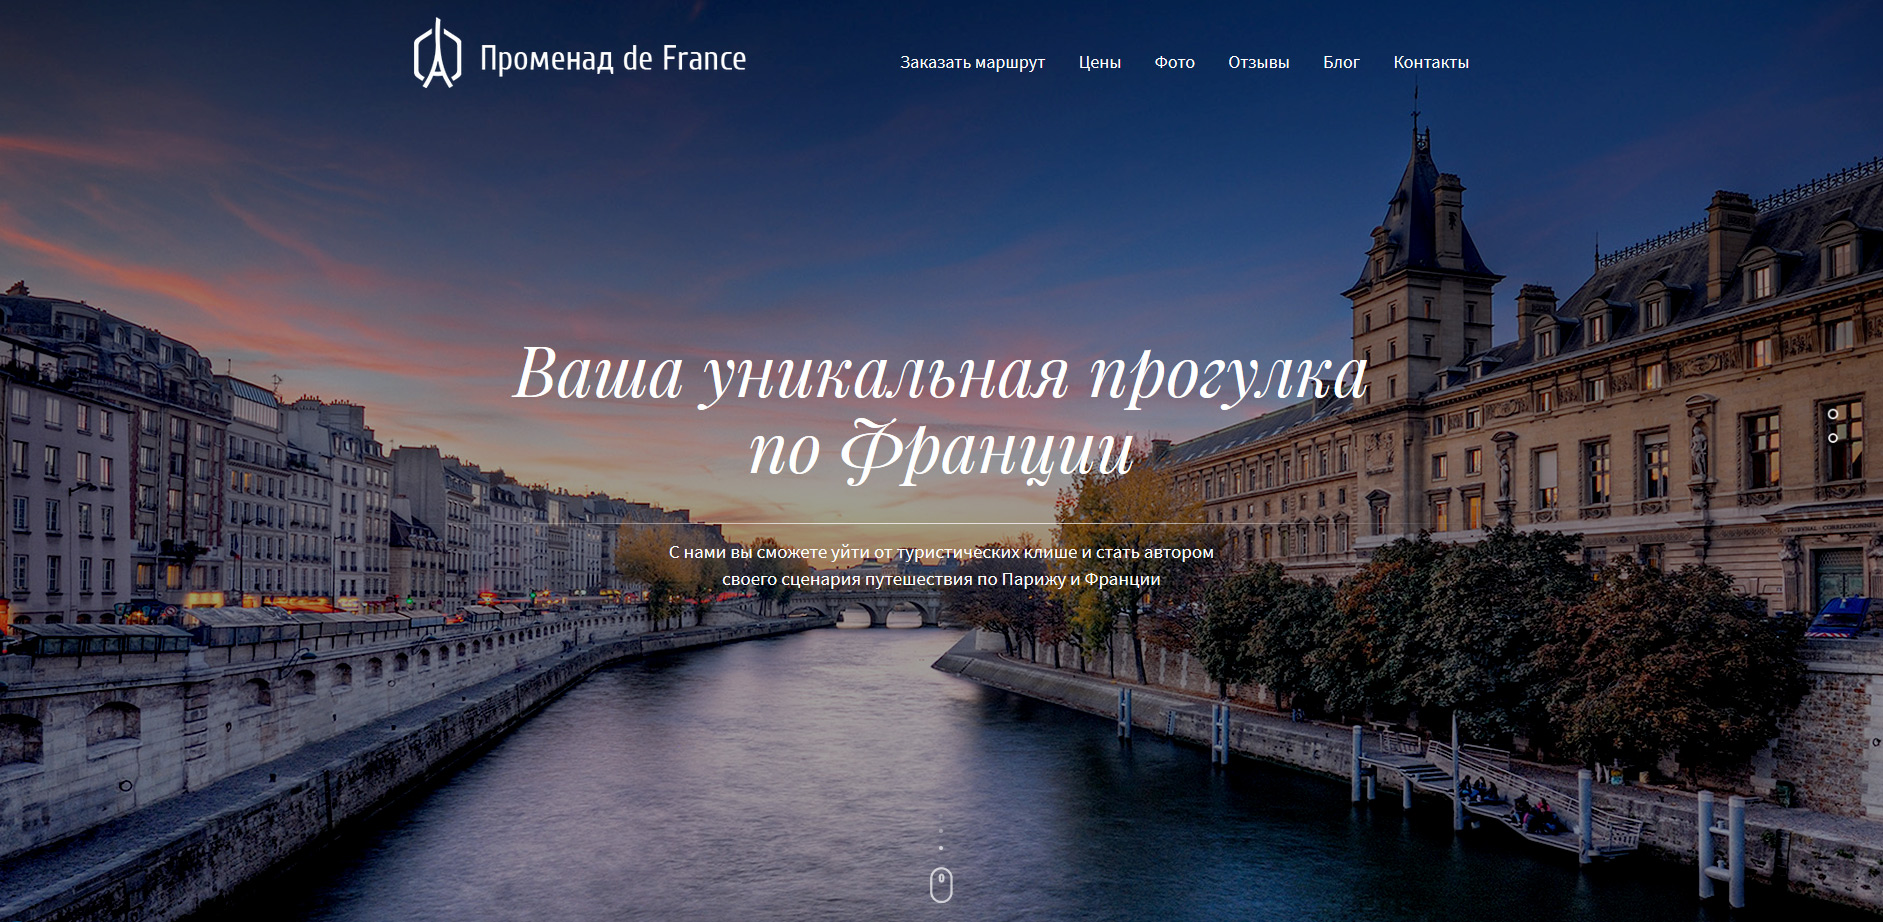 promenadefrance.ru адаптивная верстка bootstrap, flex